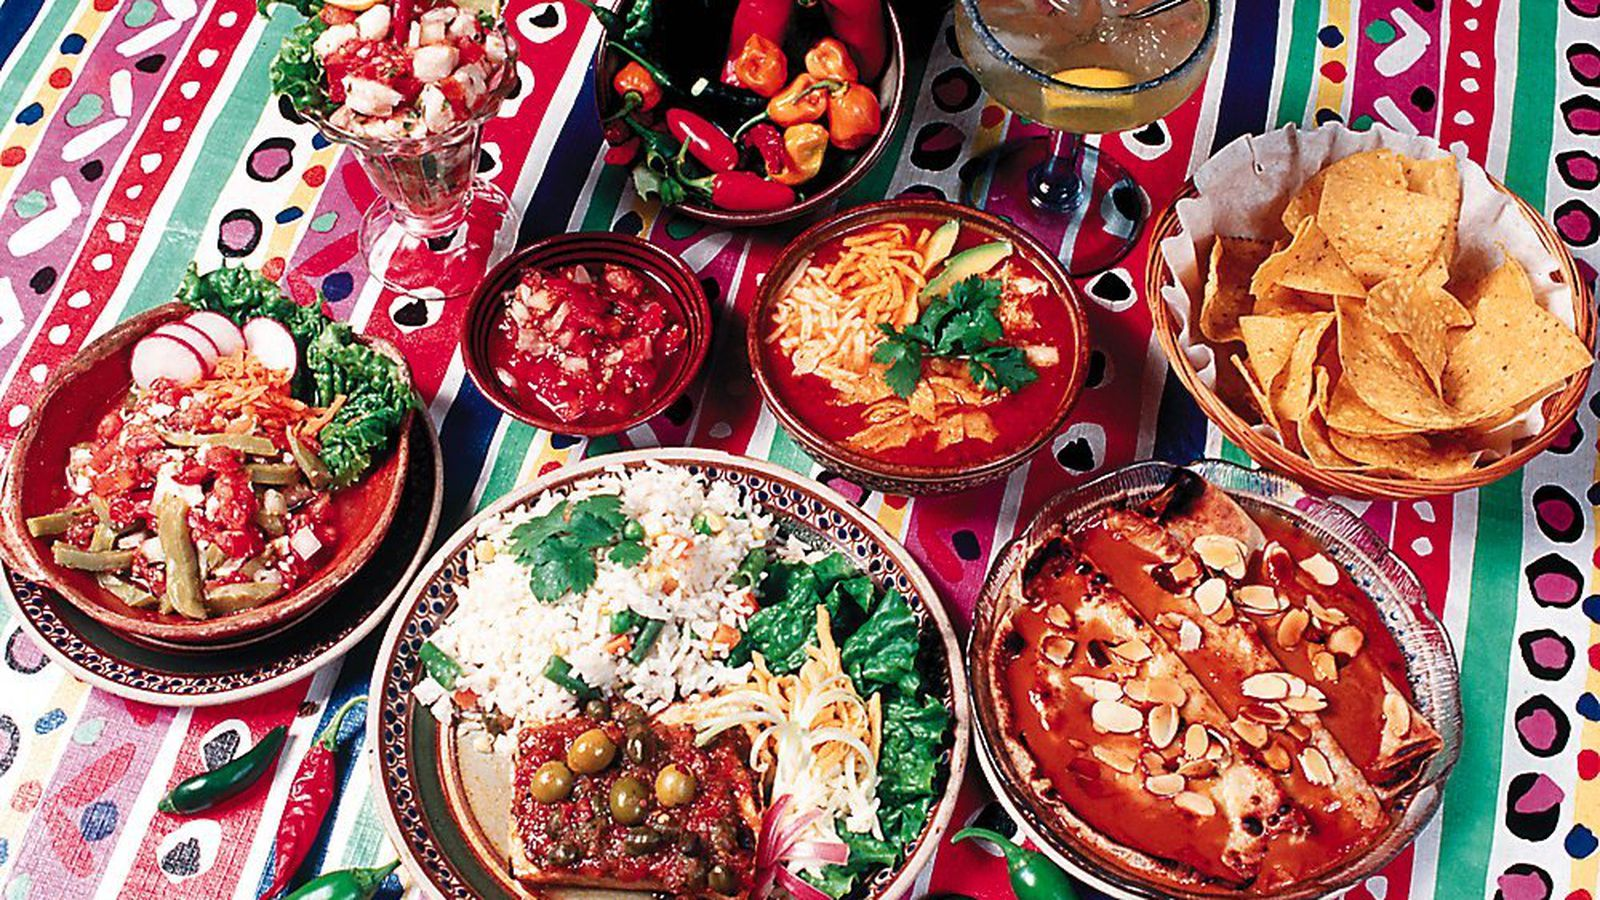 Casa Tina in Dunedin serves up Mexican cuisine.